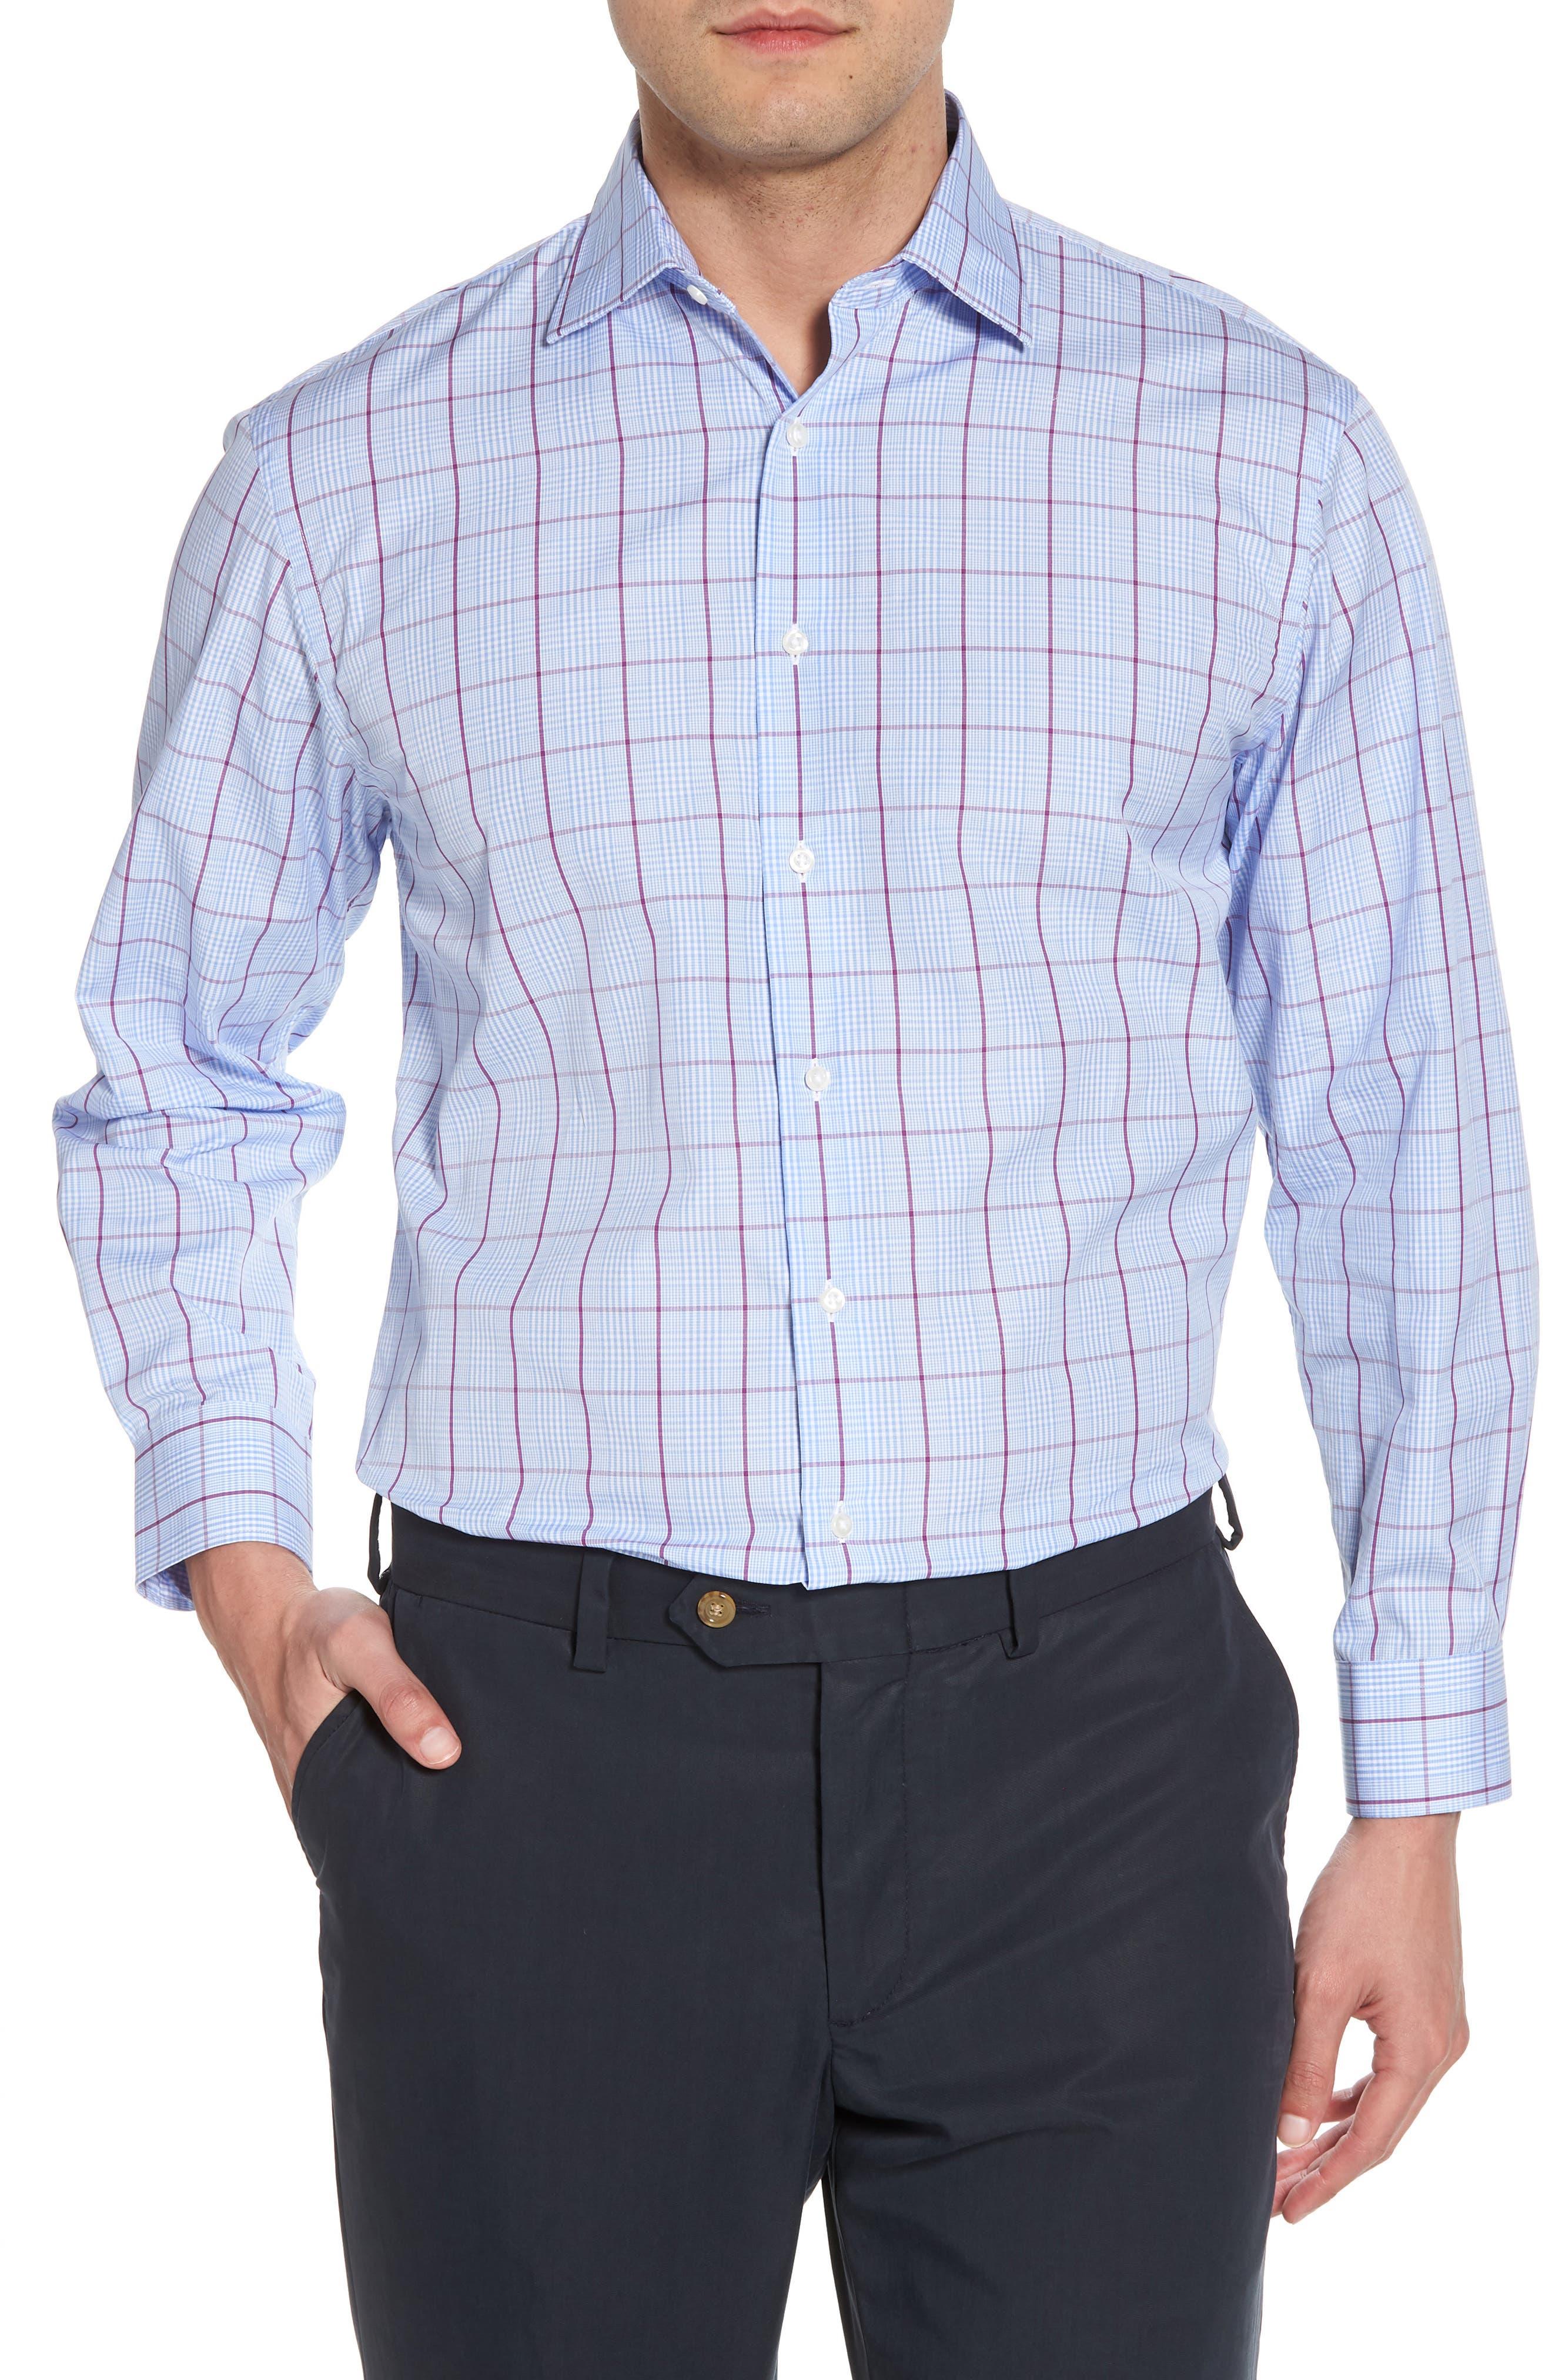 Alternate Image 1 Selected - Nordstrom Men's Shop Traditional Fit Plaid Dress Shirt